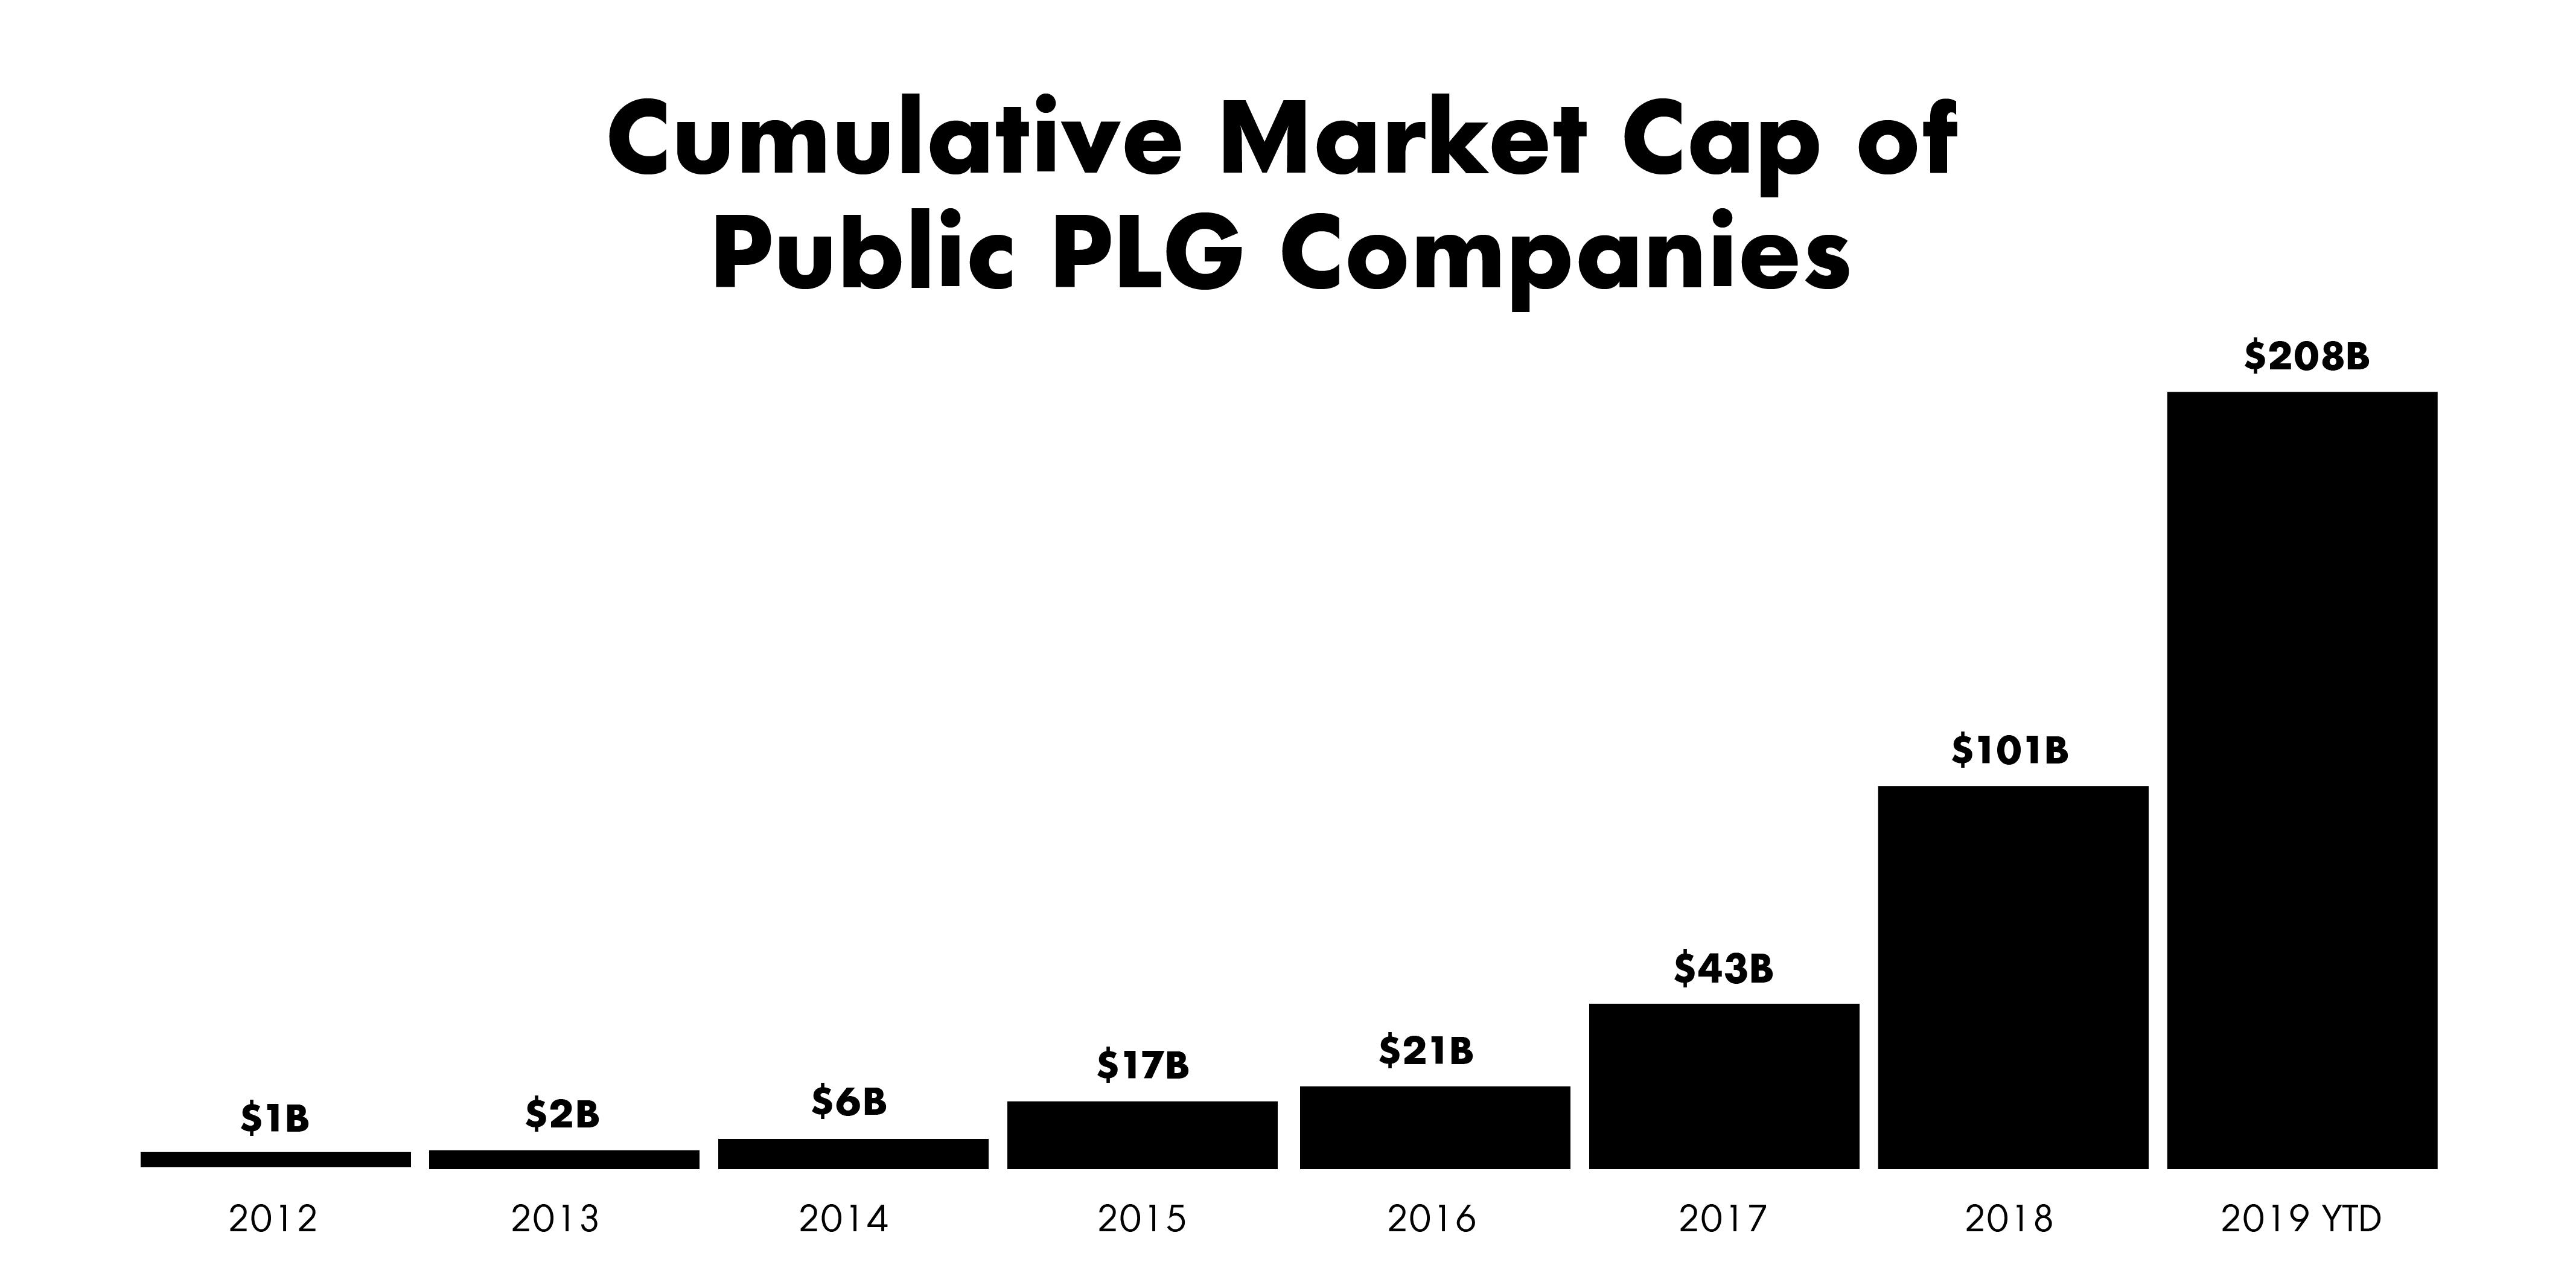 Market cap of public PLG companies